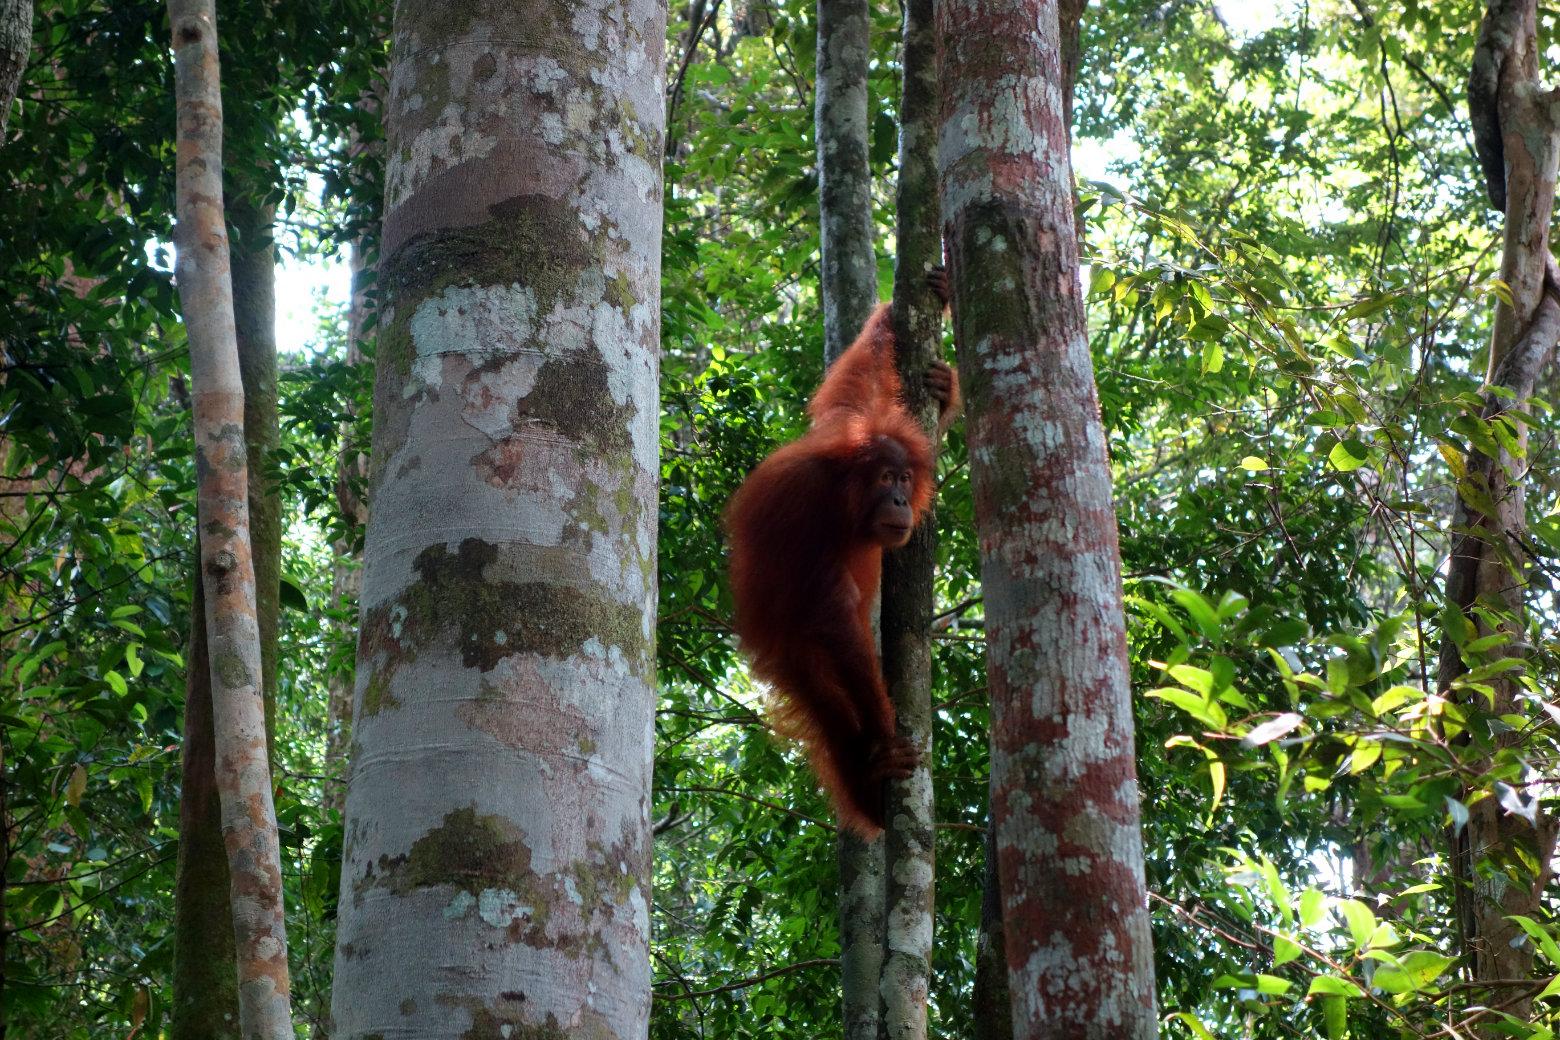 Orang Utan zwischen Bäumen